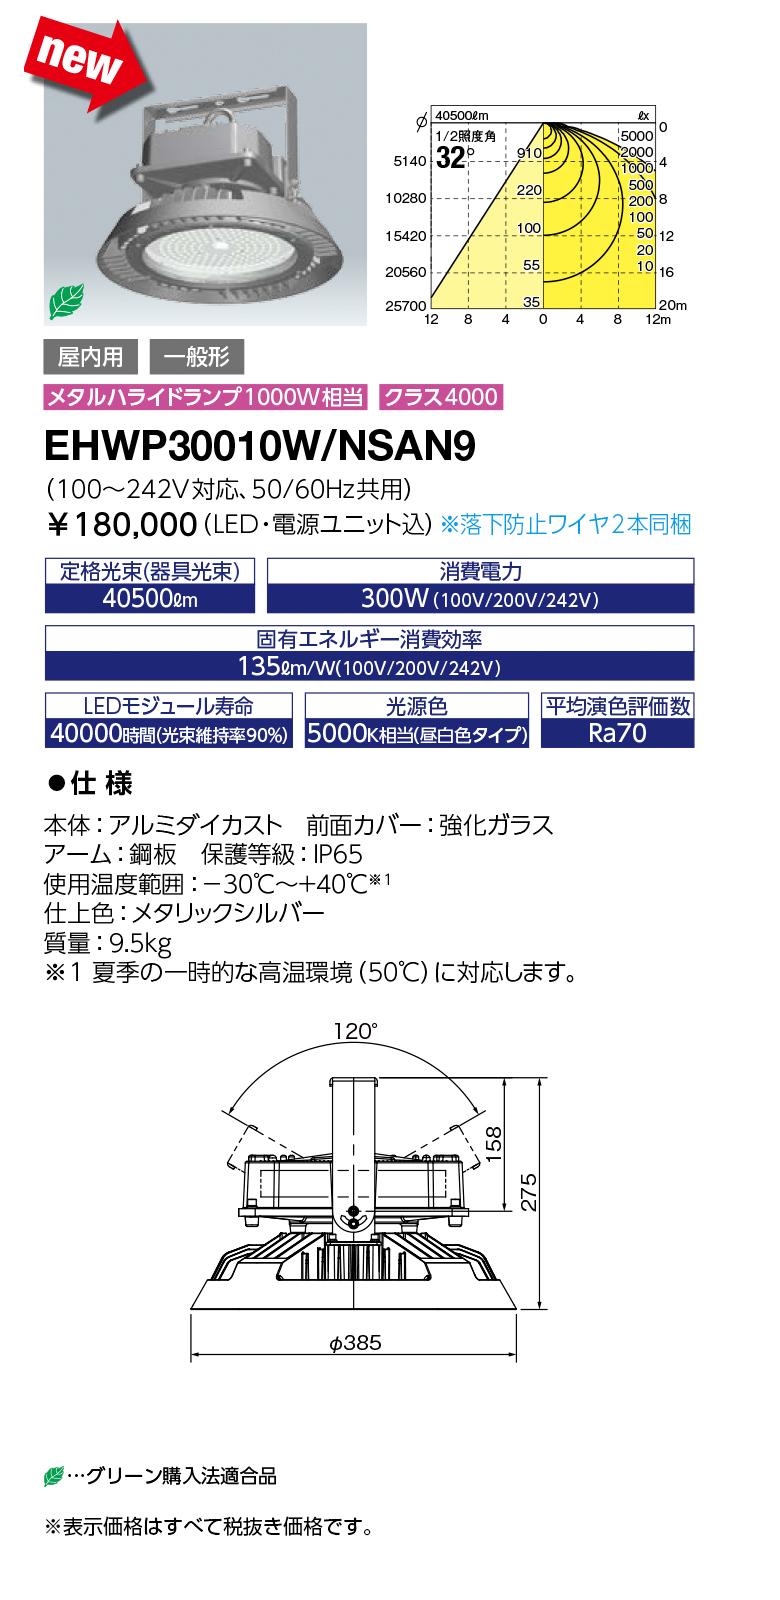 EHWP30010W/NSAN9